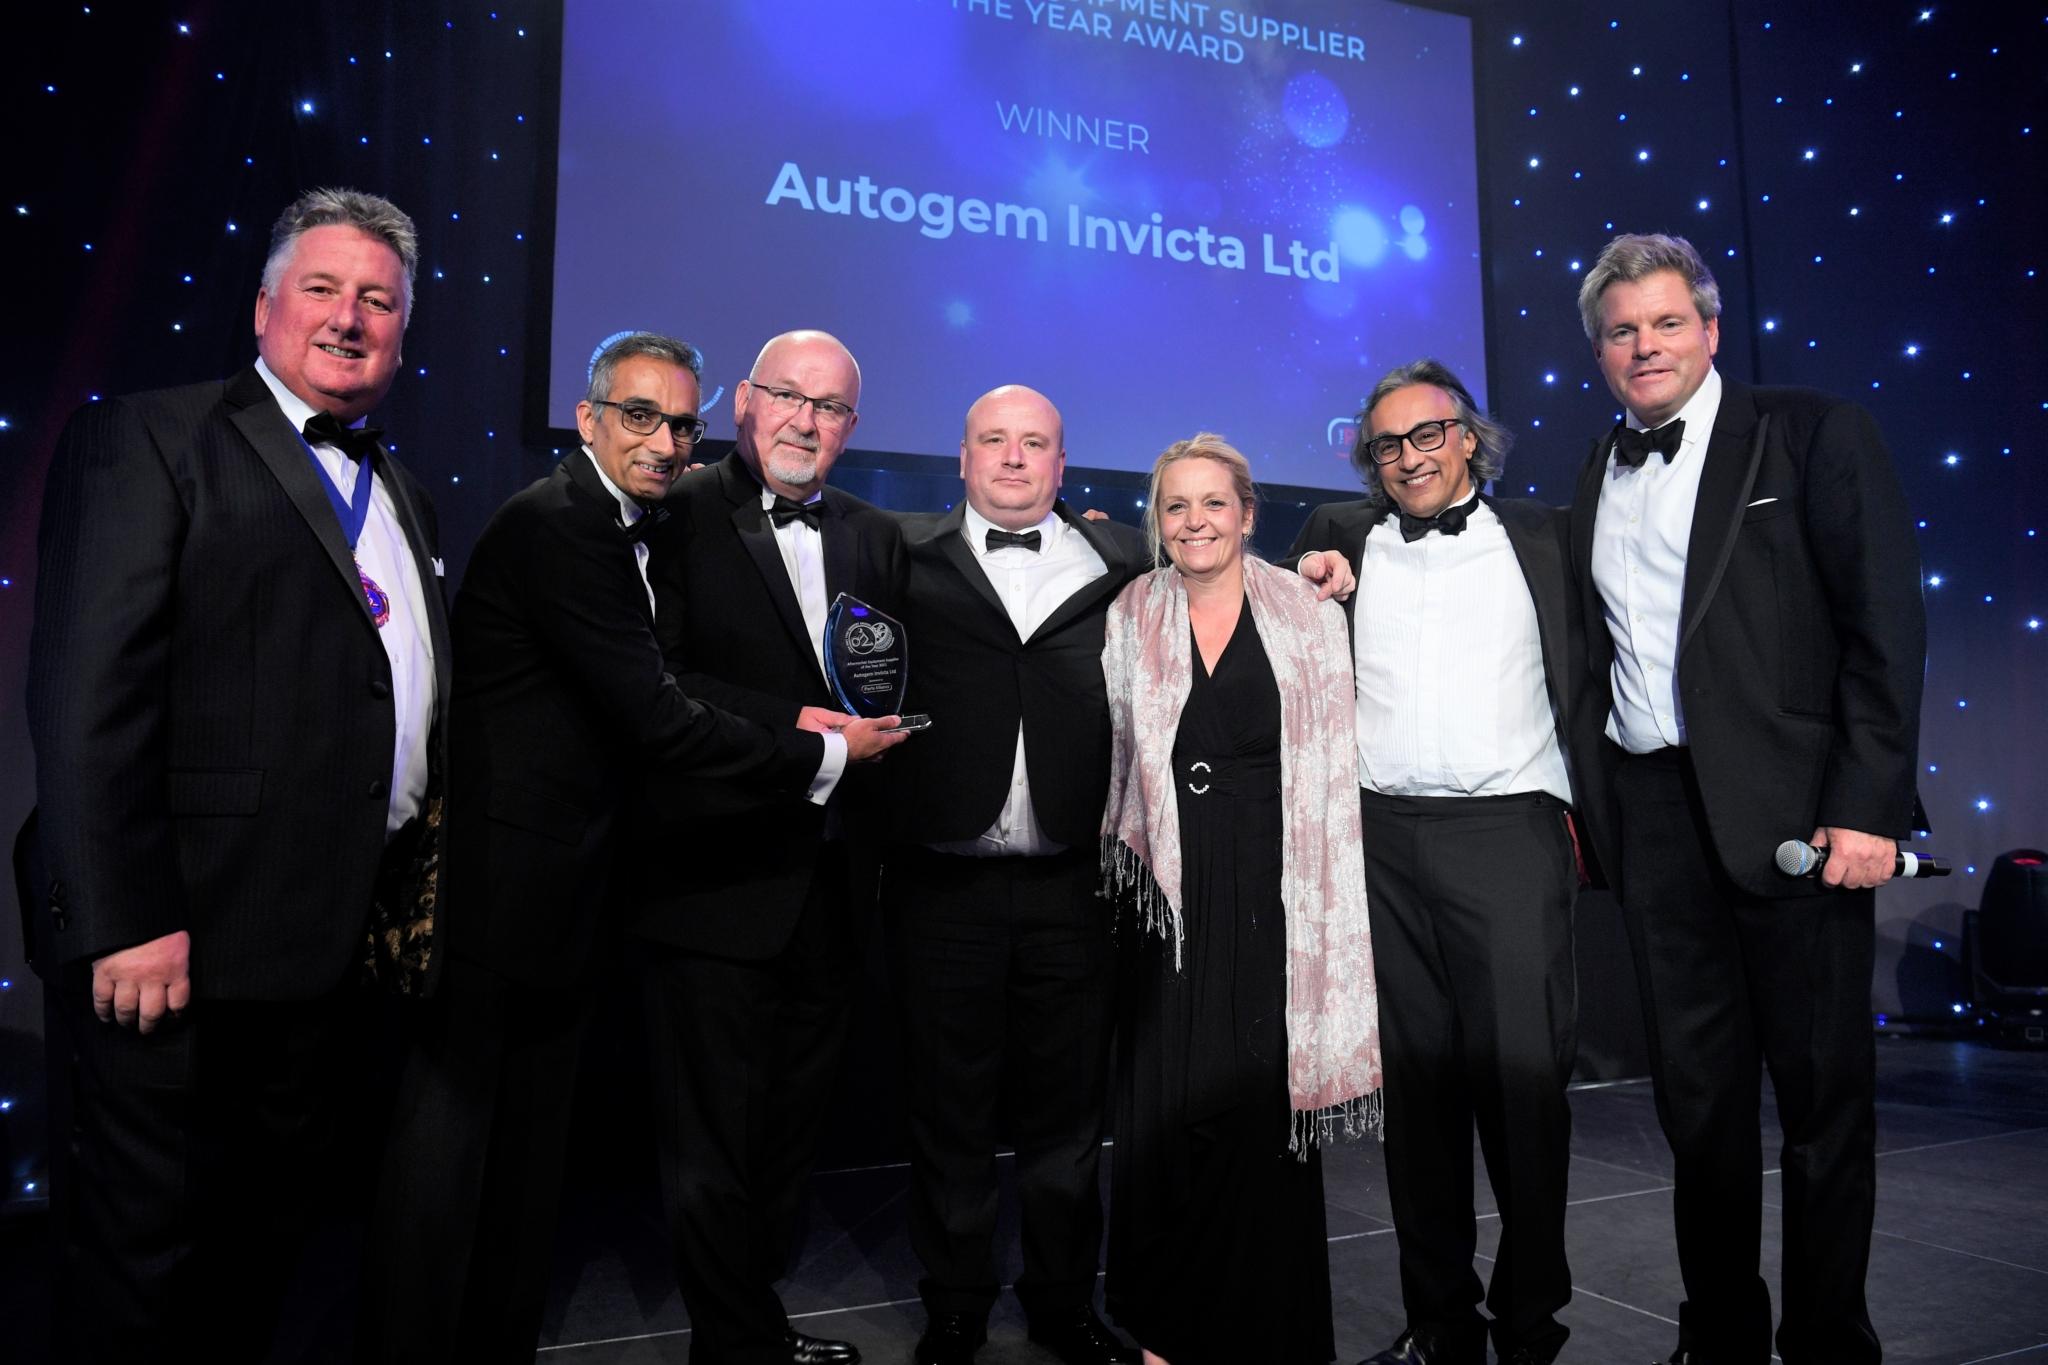 Autogem 'an indispensable aftermarket partner' – Tyre Industry Awards 2021